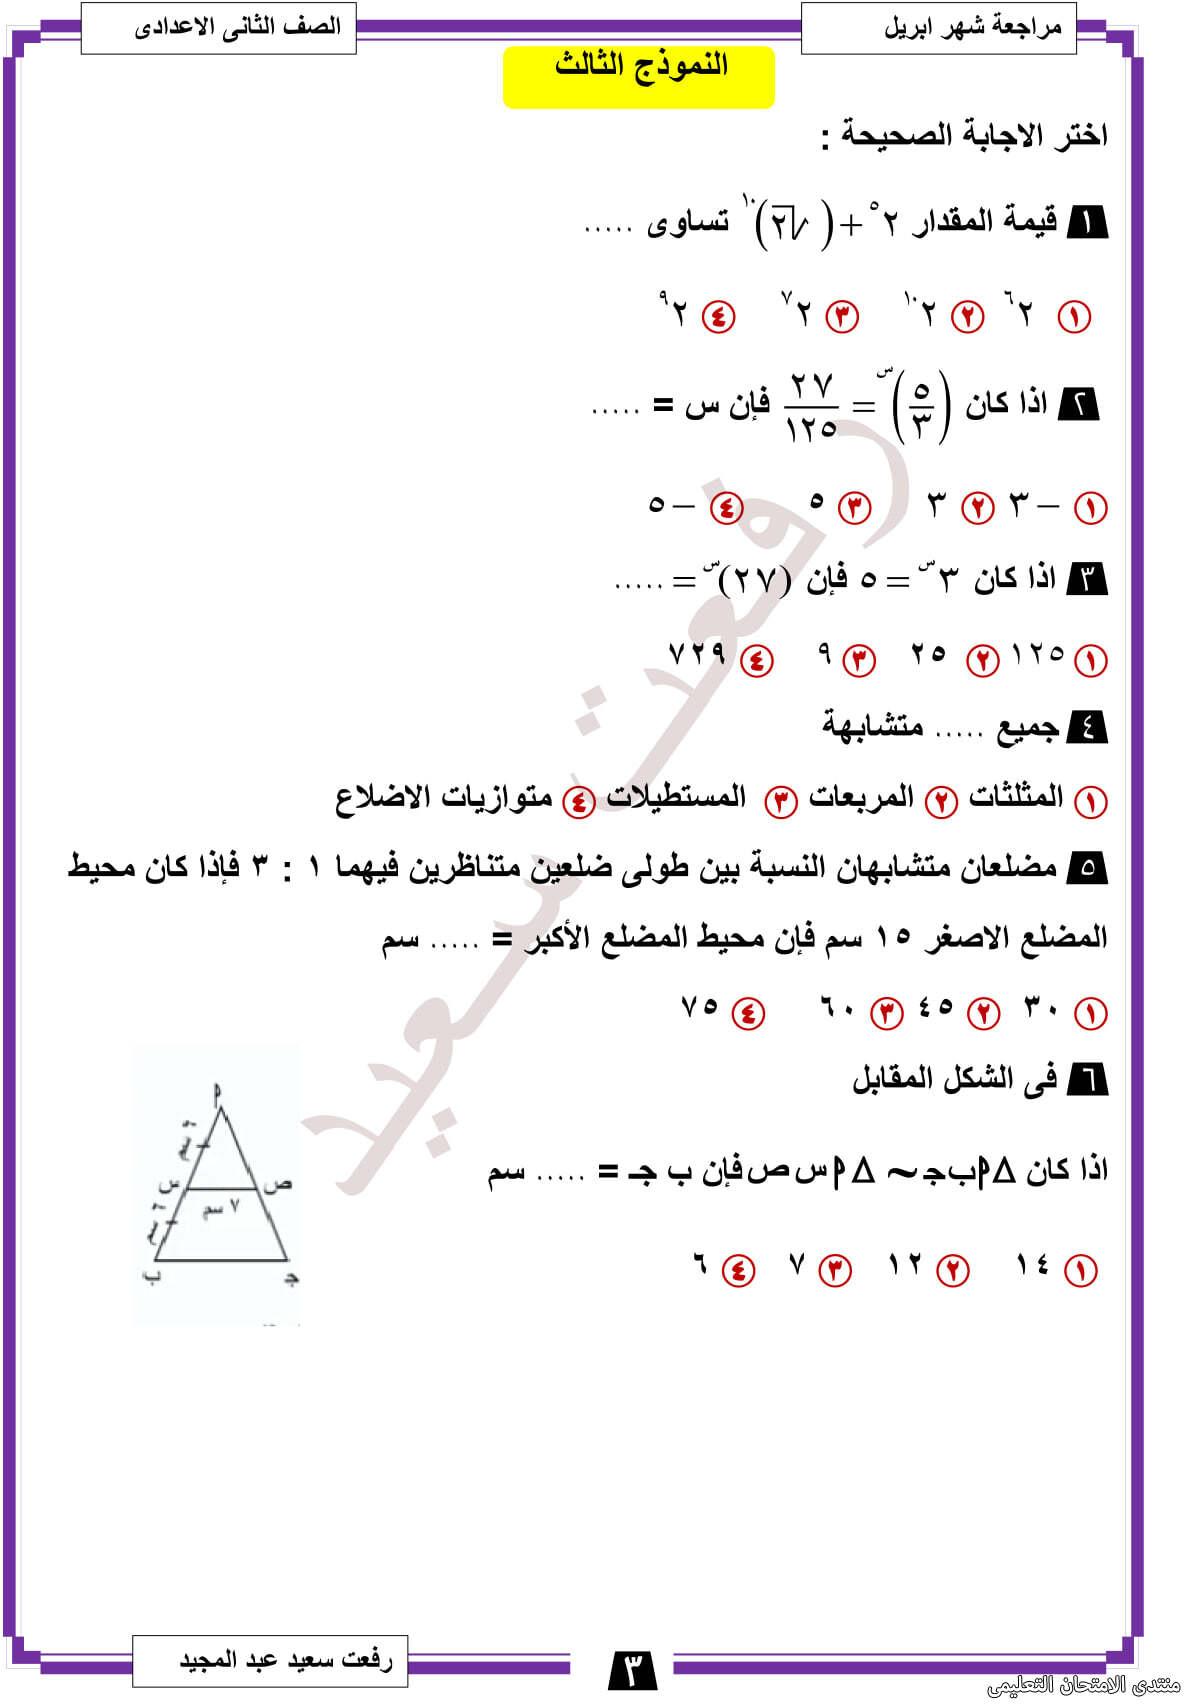 exam-eg.com_161904908753723.jpg